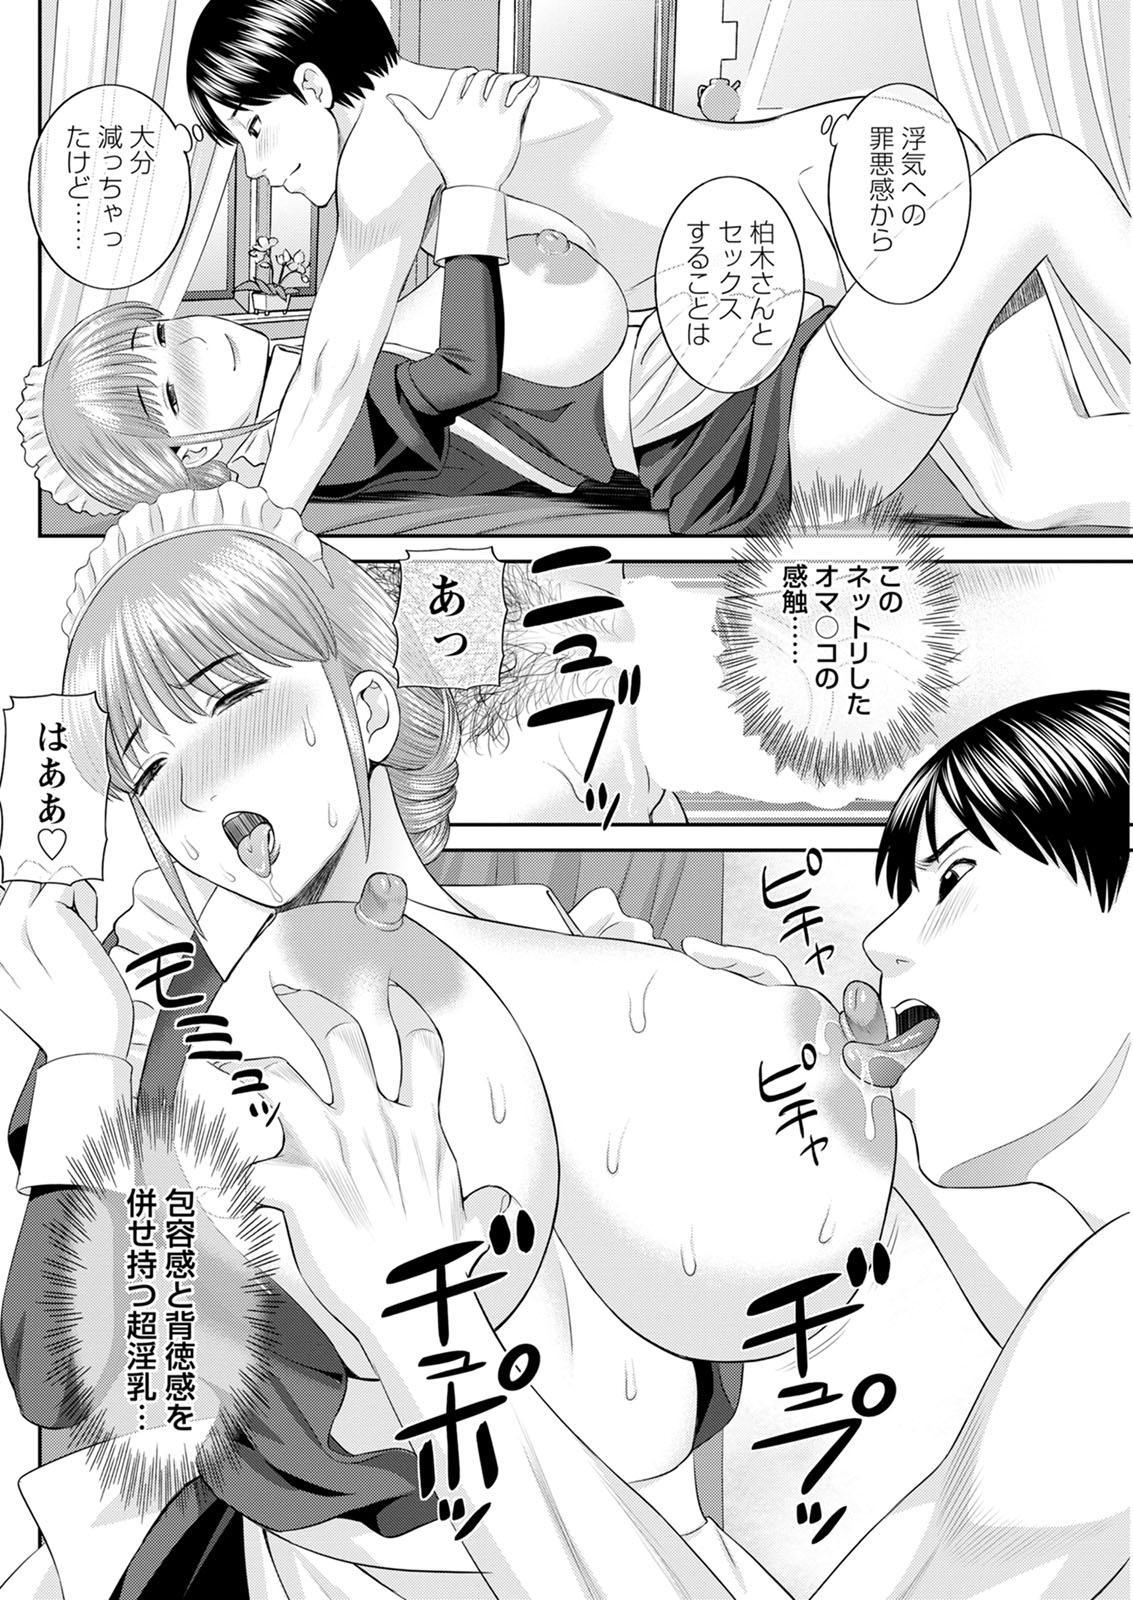 [Kawamori Misaki] Kaikan Hitotsuma Gakuen Ch. 1-6, 8-20 [Digital] 346